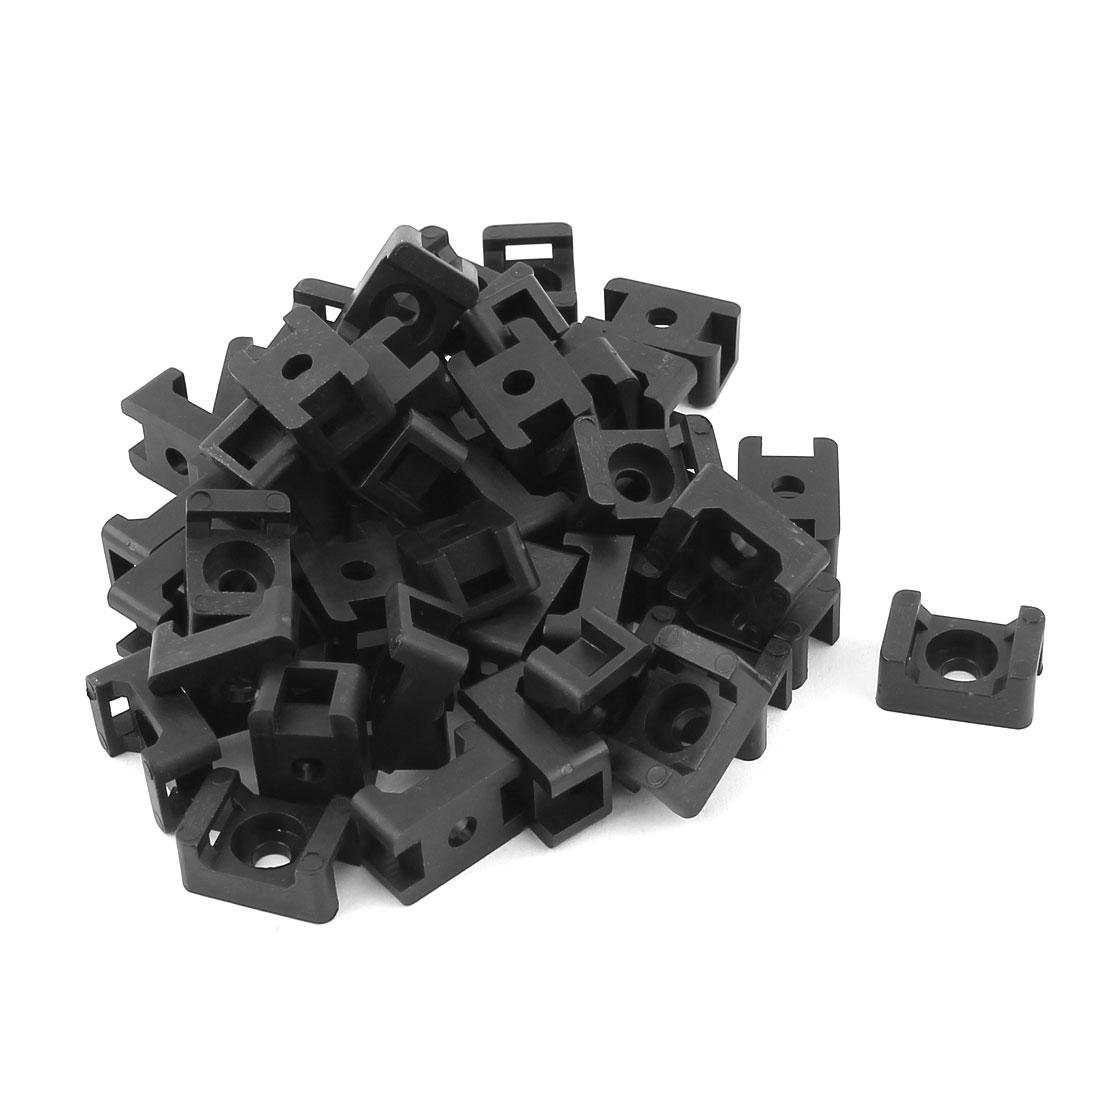 45pcs Black Plastic Screw Mounts Saddles Bases Cable Tie Cradle Holder